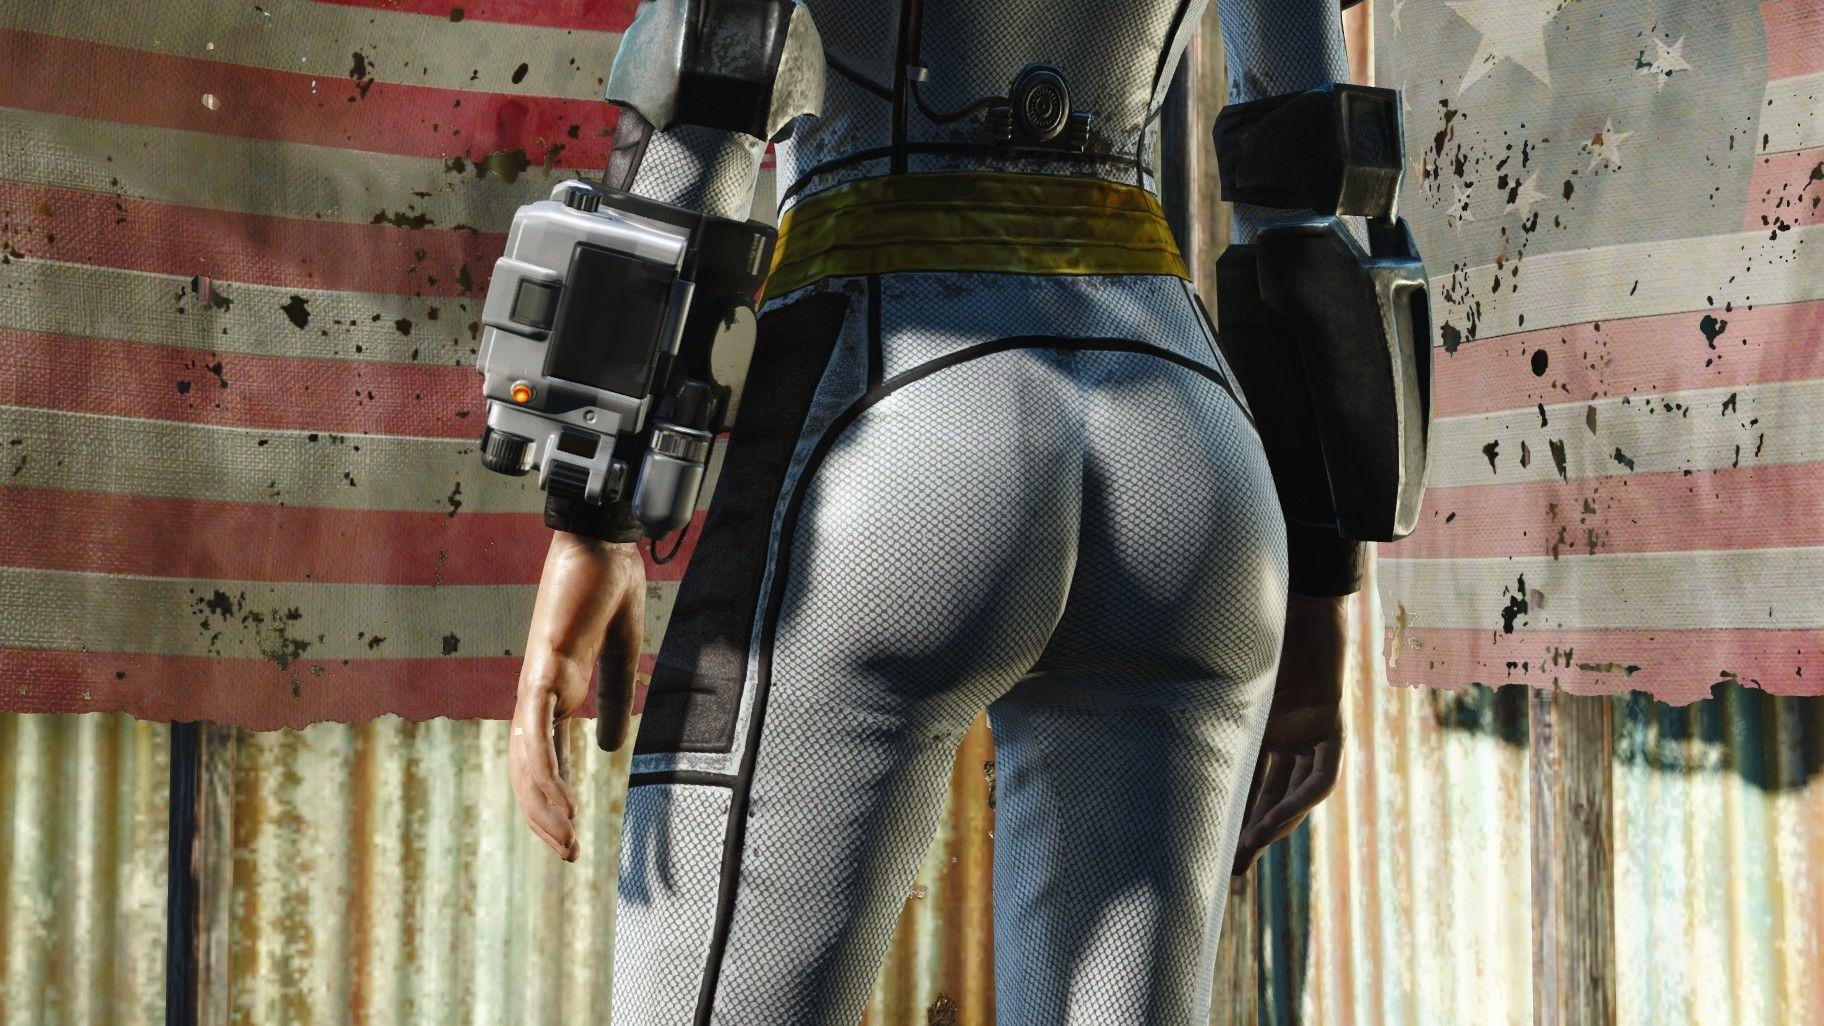 Pin on Fallout 4 Mods